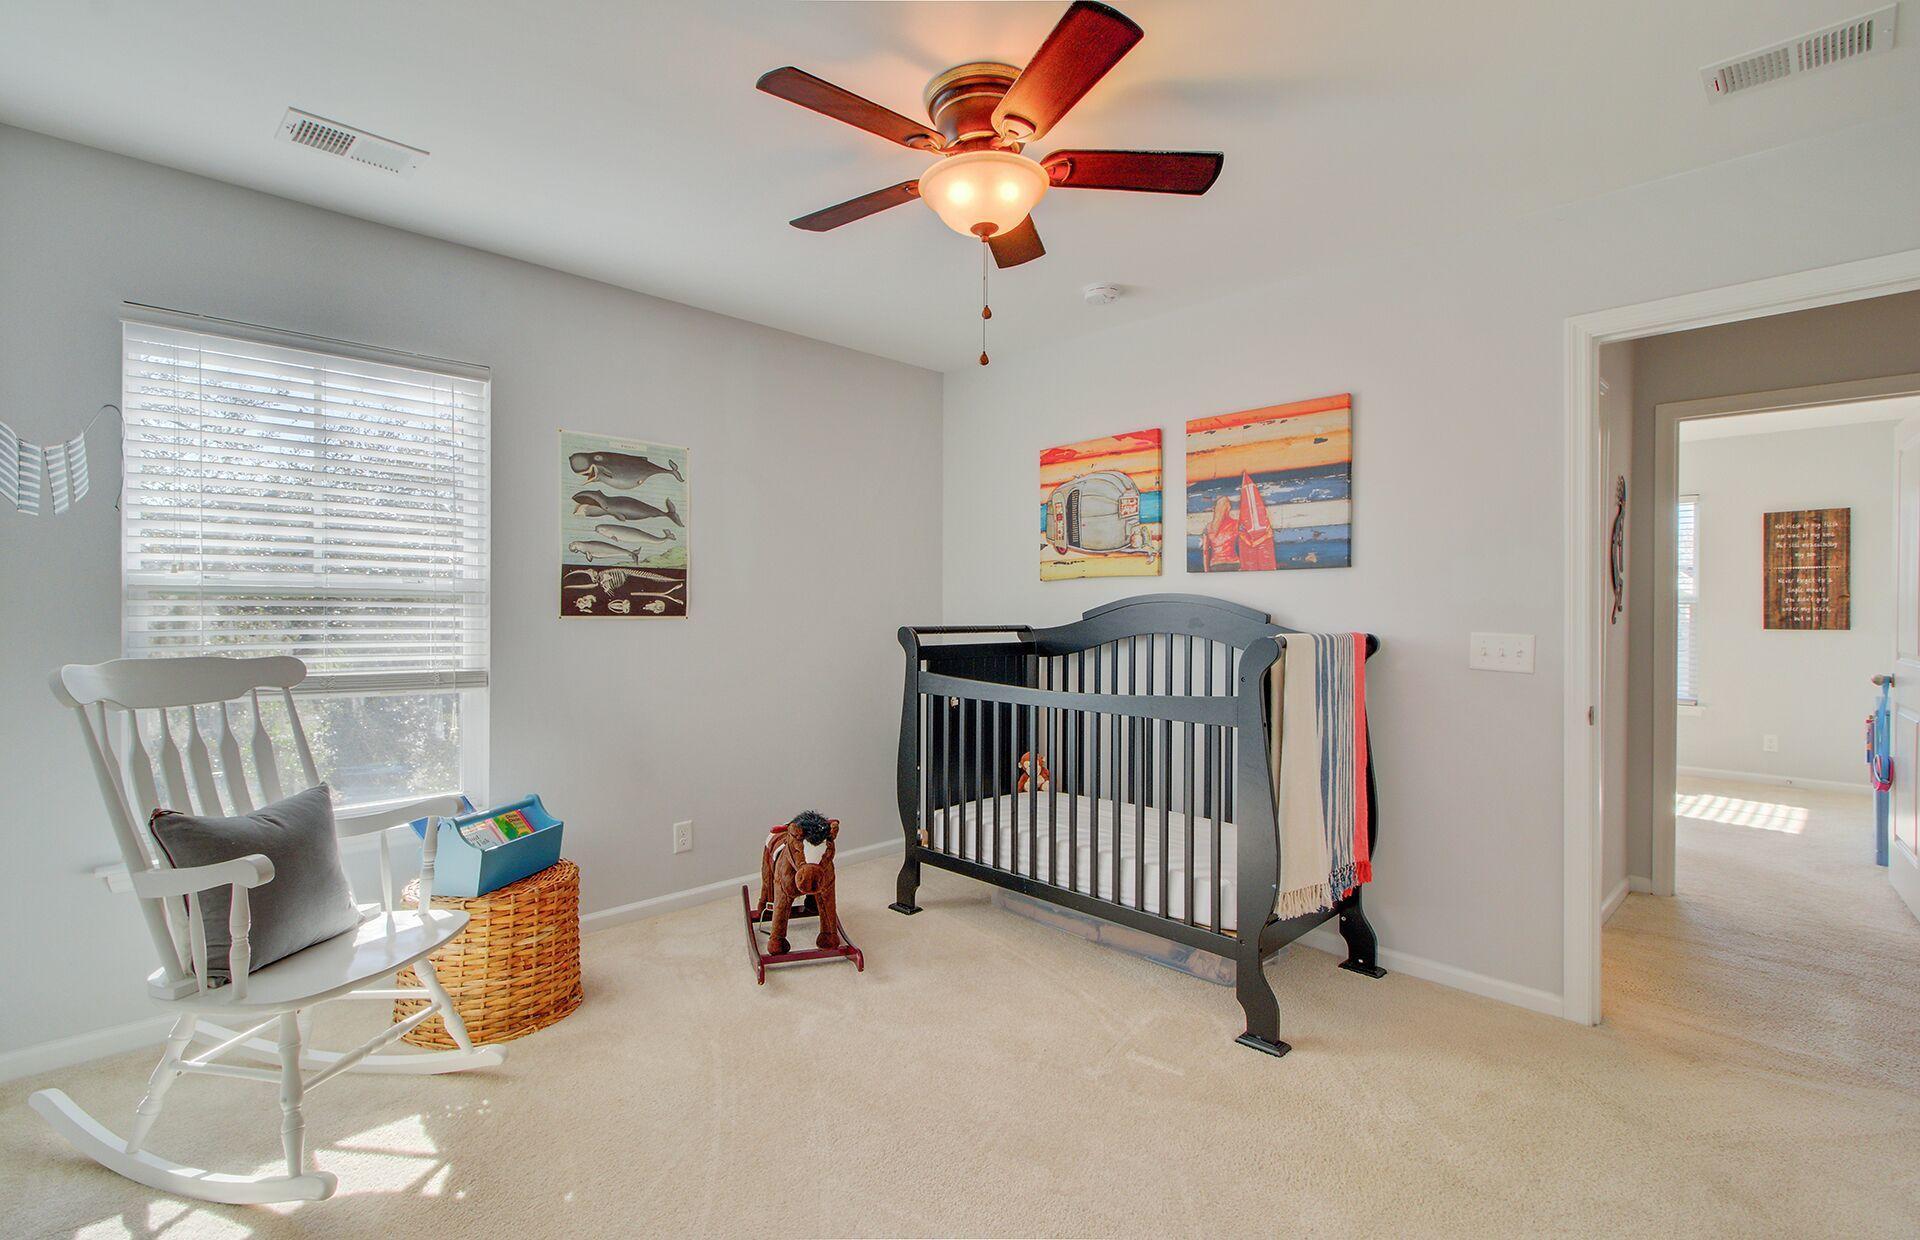 Oak Terrace Preserve Homes For Sale - 4967 Liberty Park, North Charleston, SC - 14